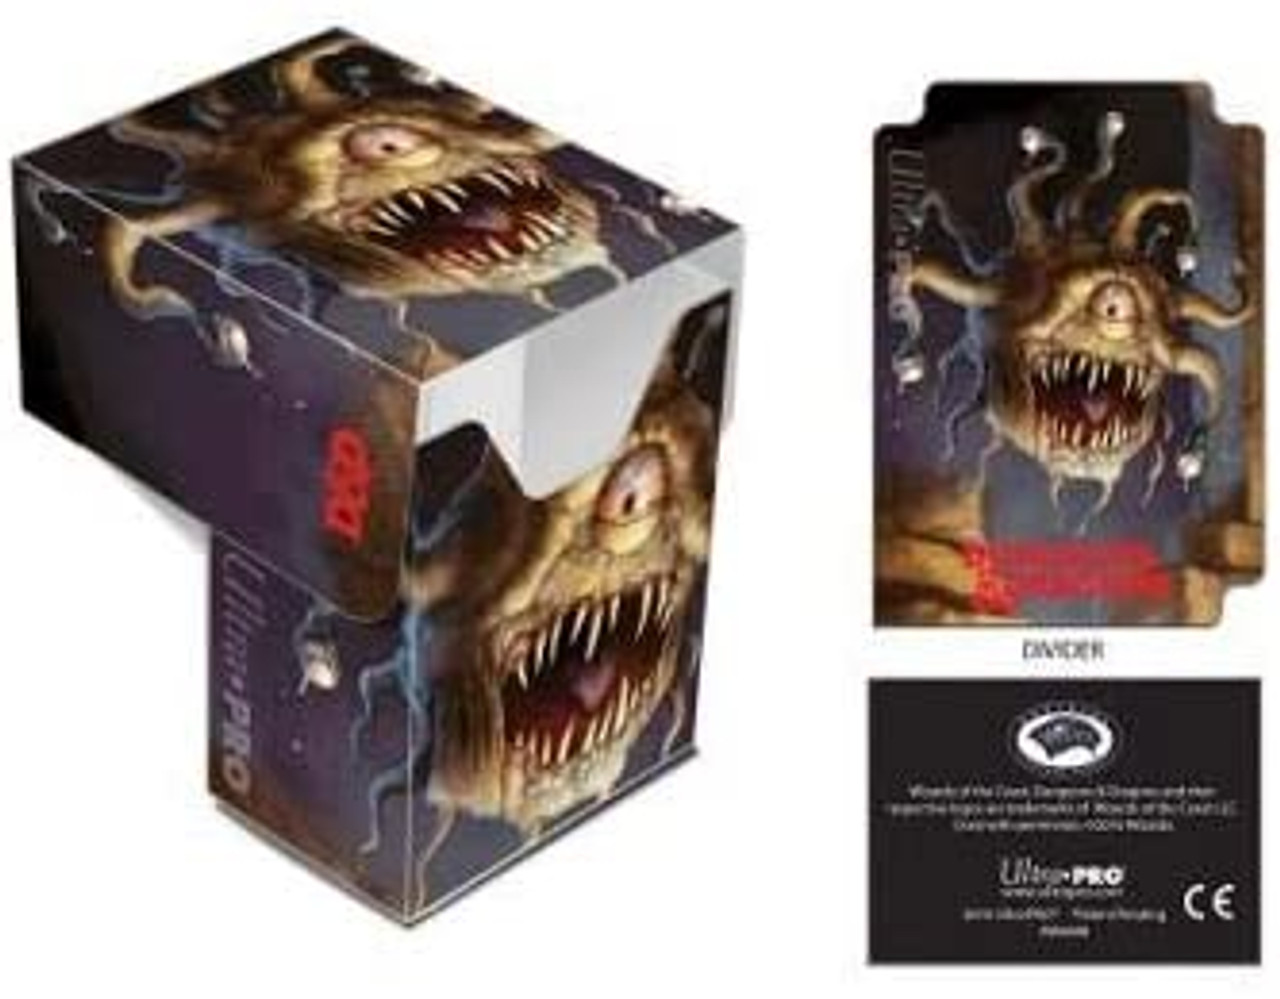 Deck Box - Dungeons & Dragons - Beholder - Special Order